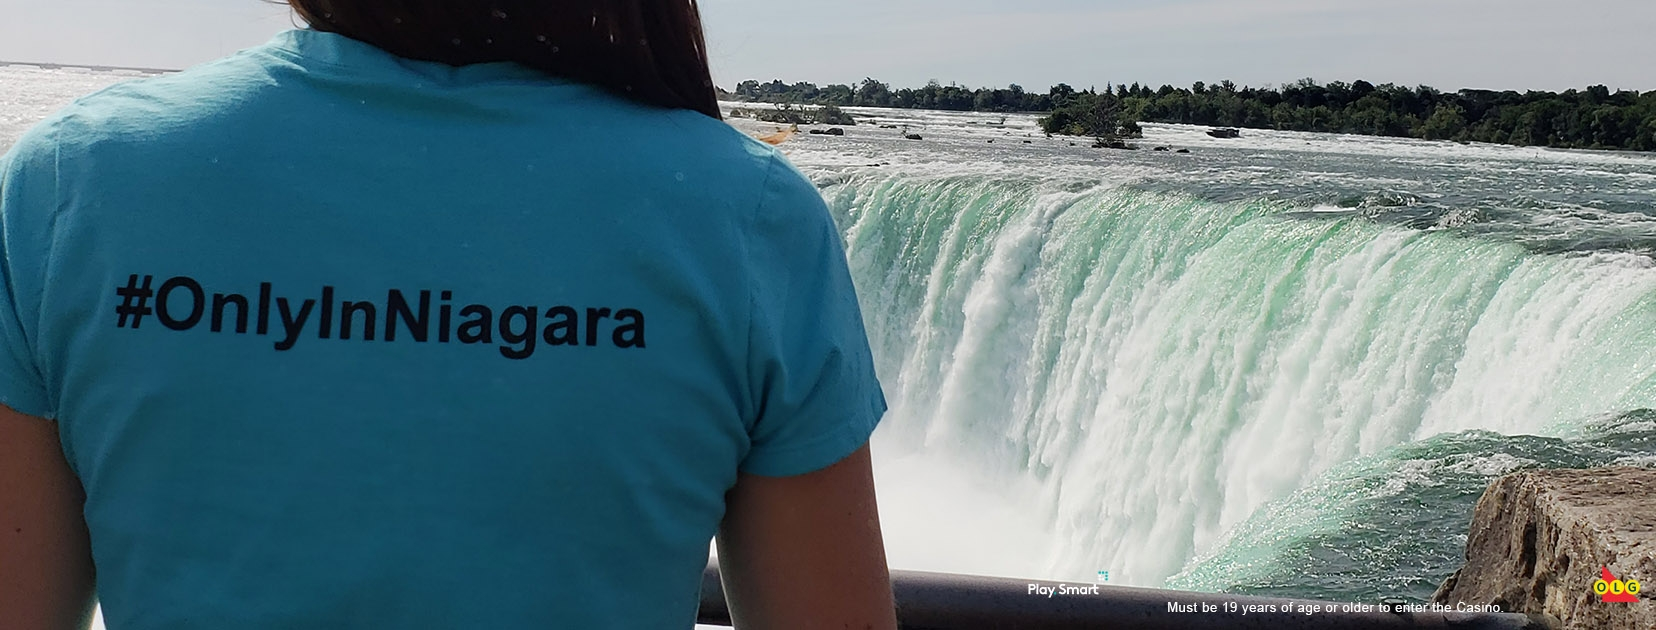 Niagara Fallsview Casino  (@fallsviewcasino) Cover Image